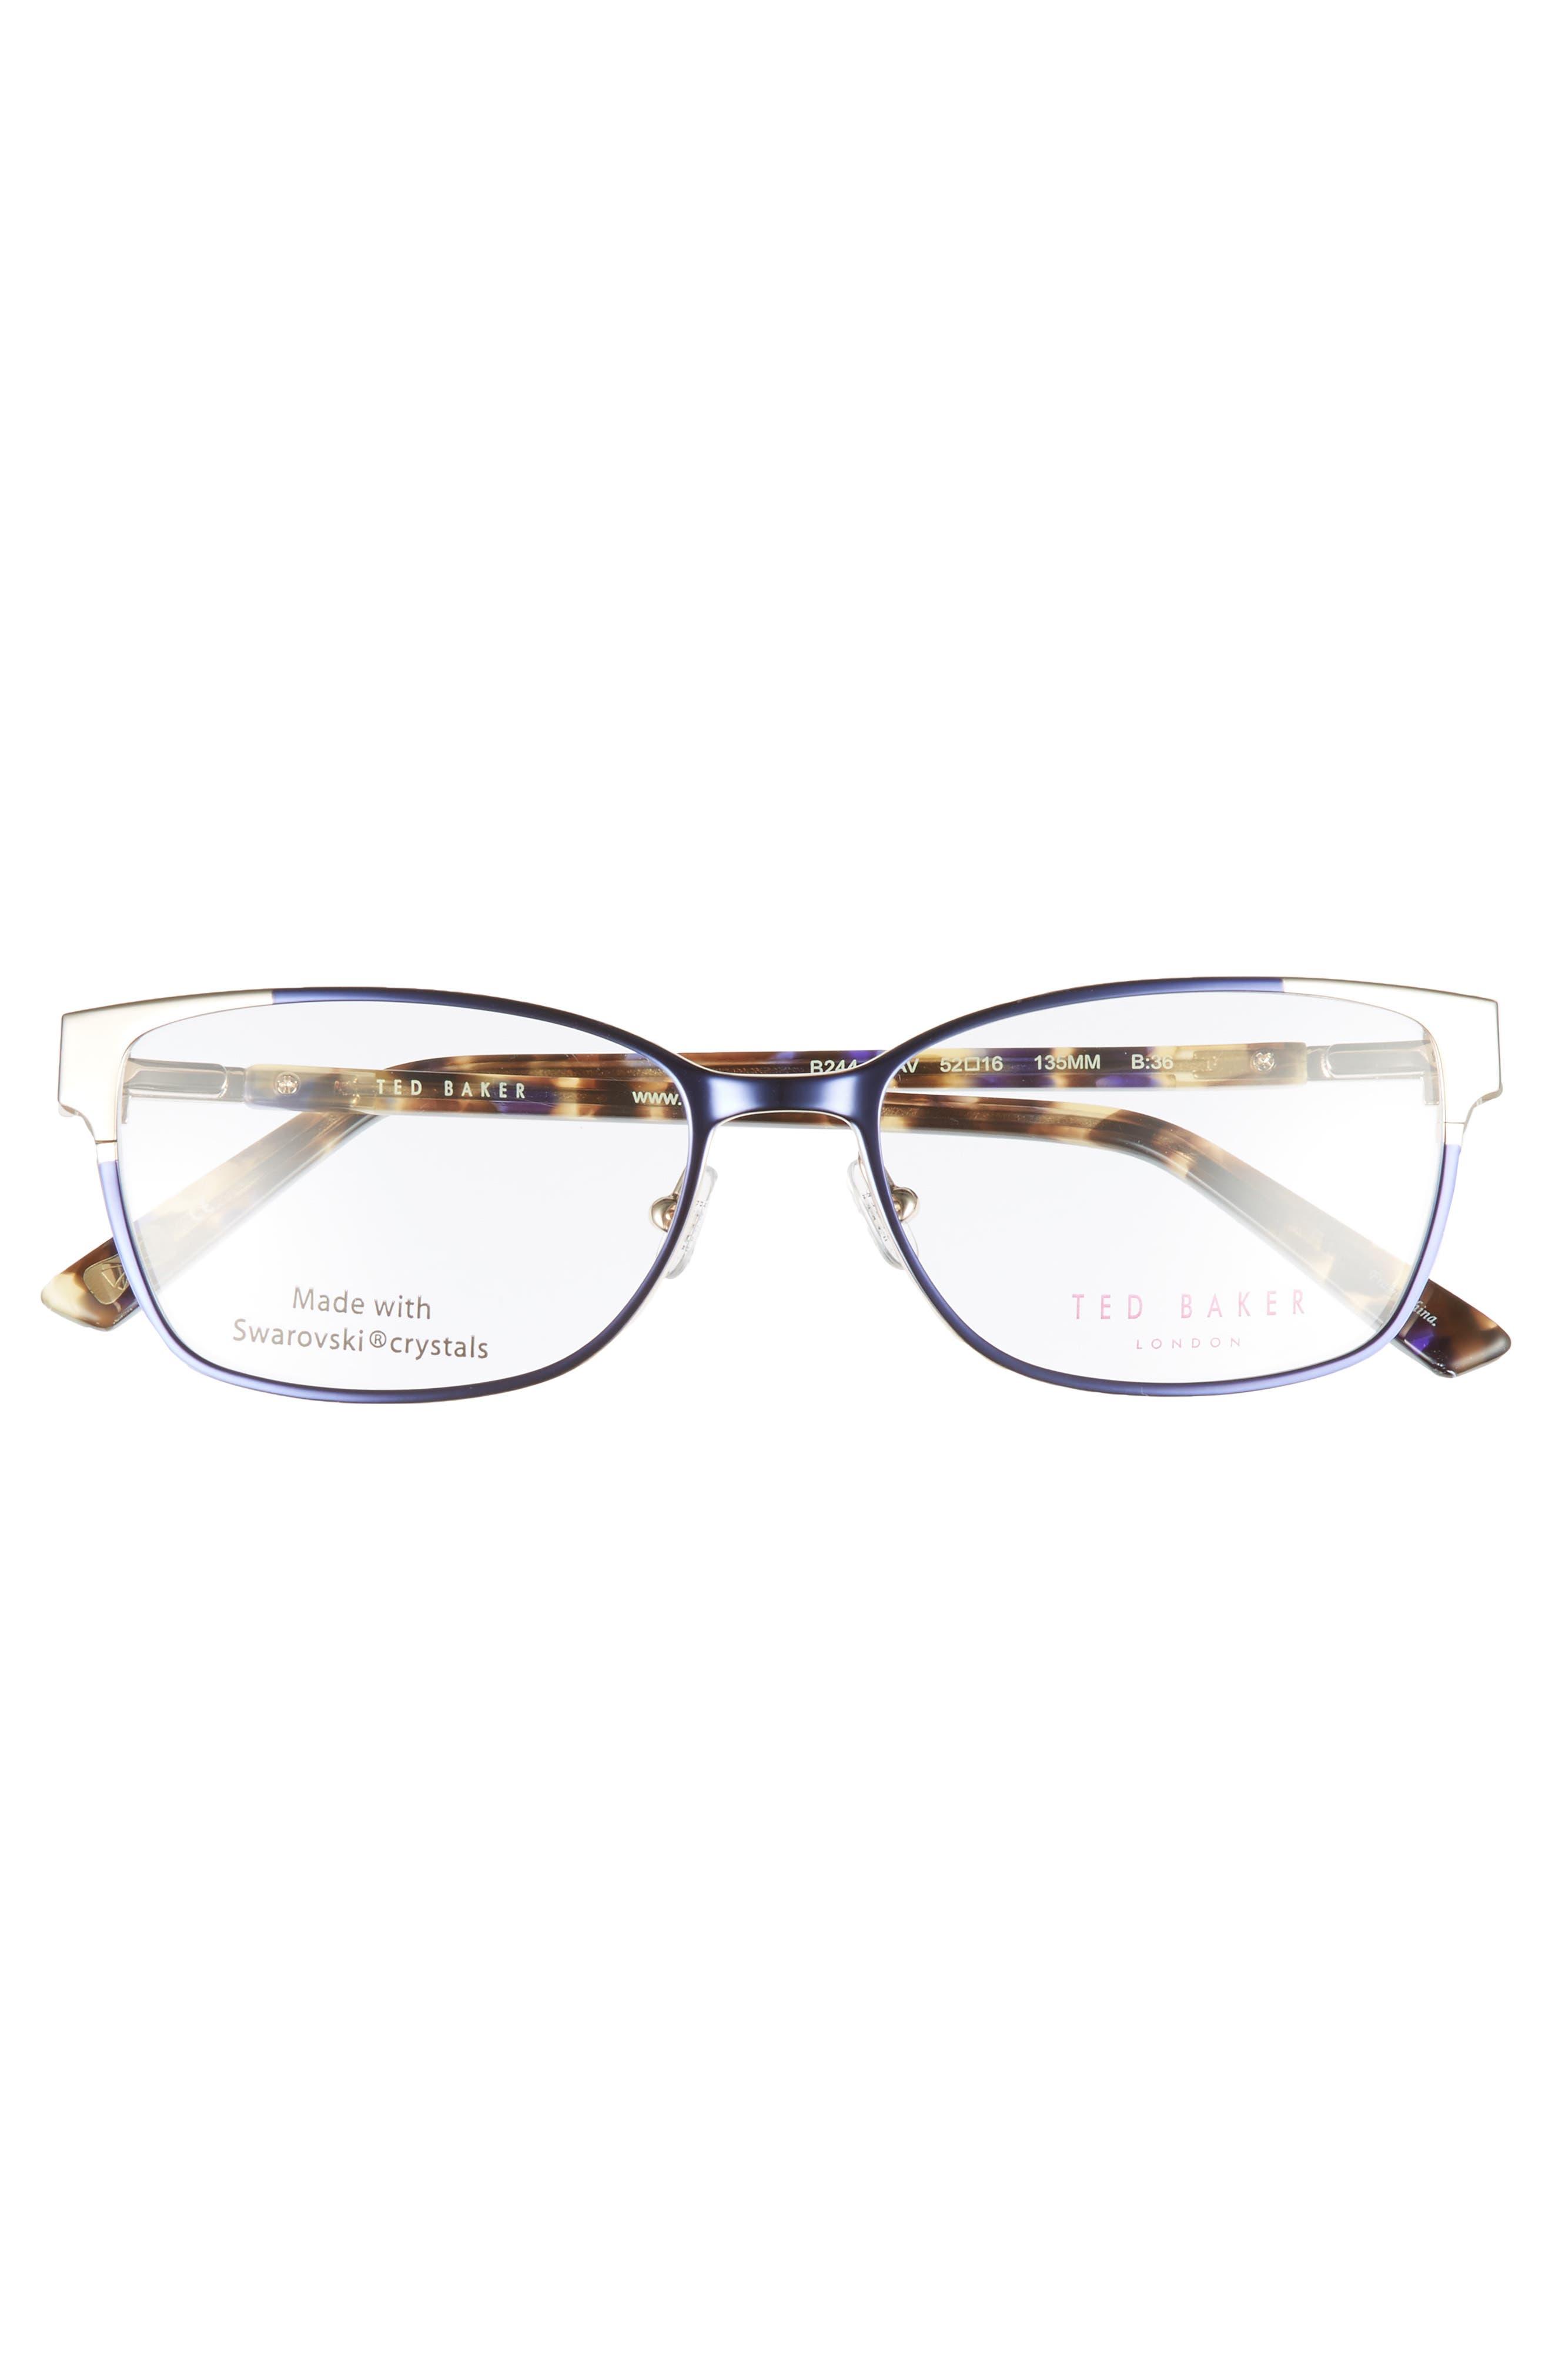 52mm Crystal Rectangular Optical Glasses,                             Alternate thumbnail 3, color,                             Blue